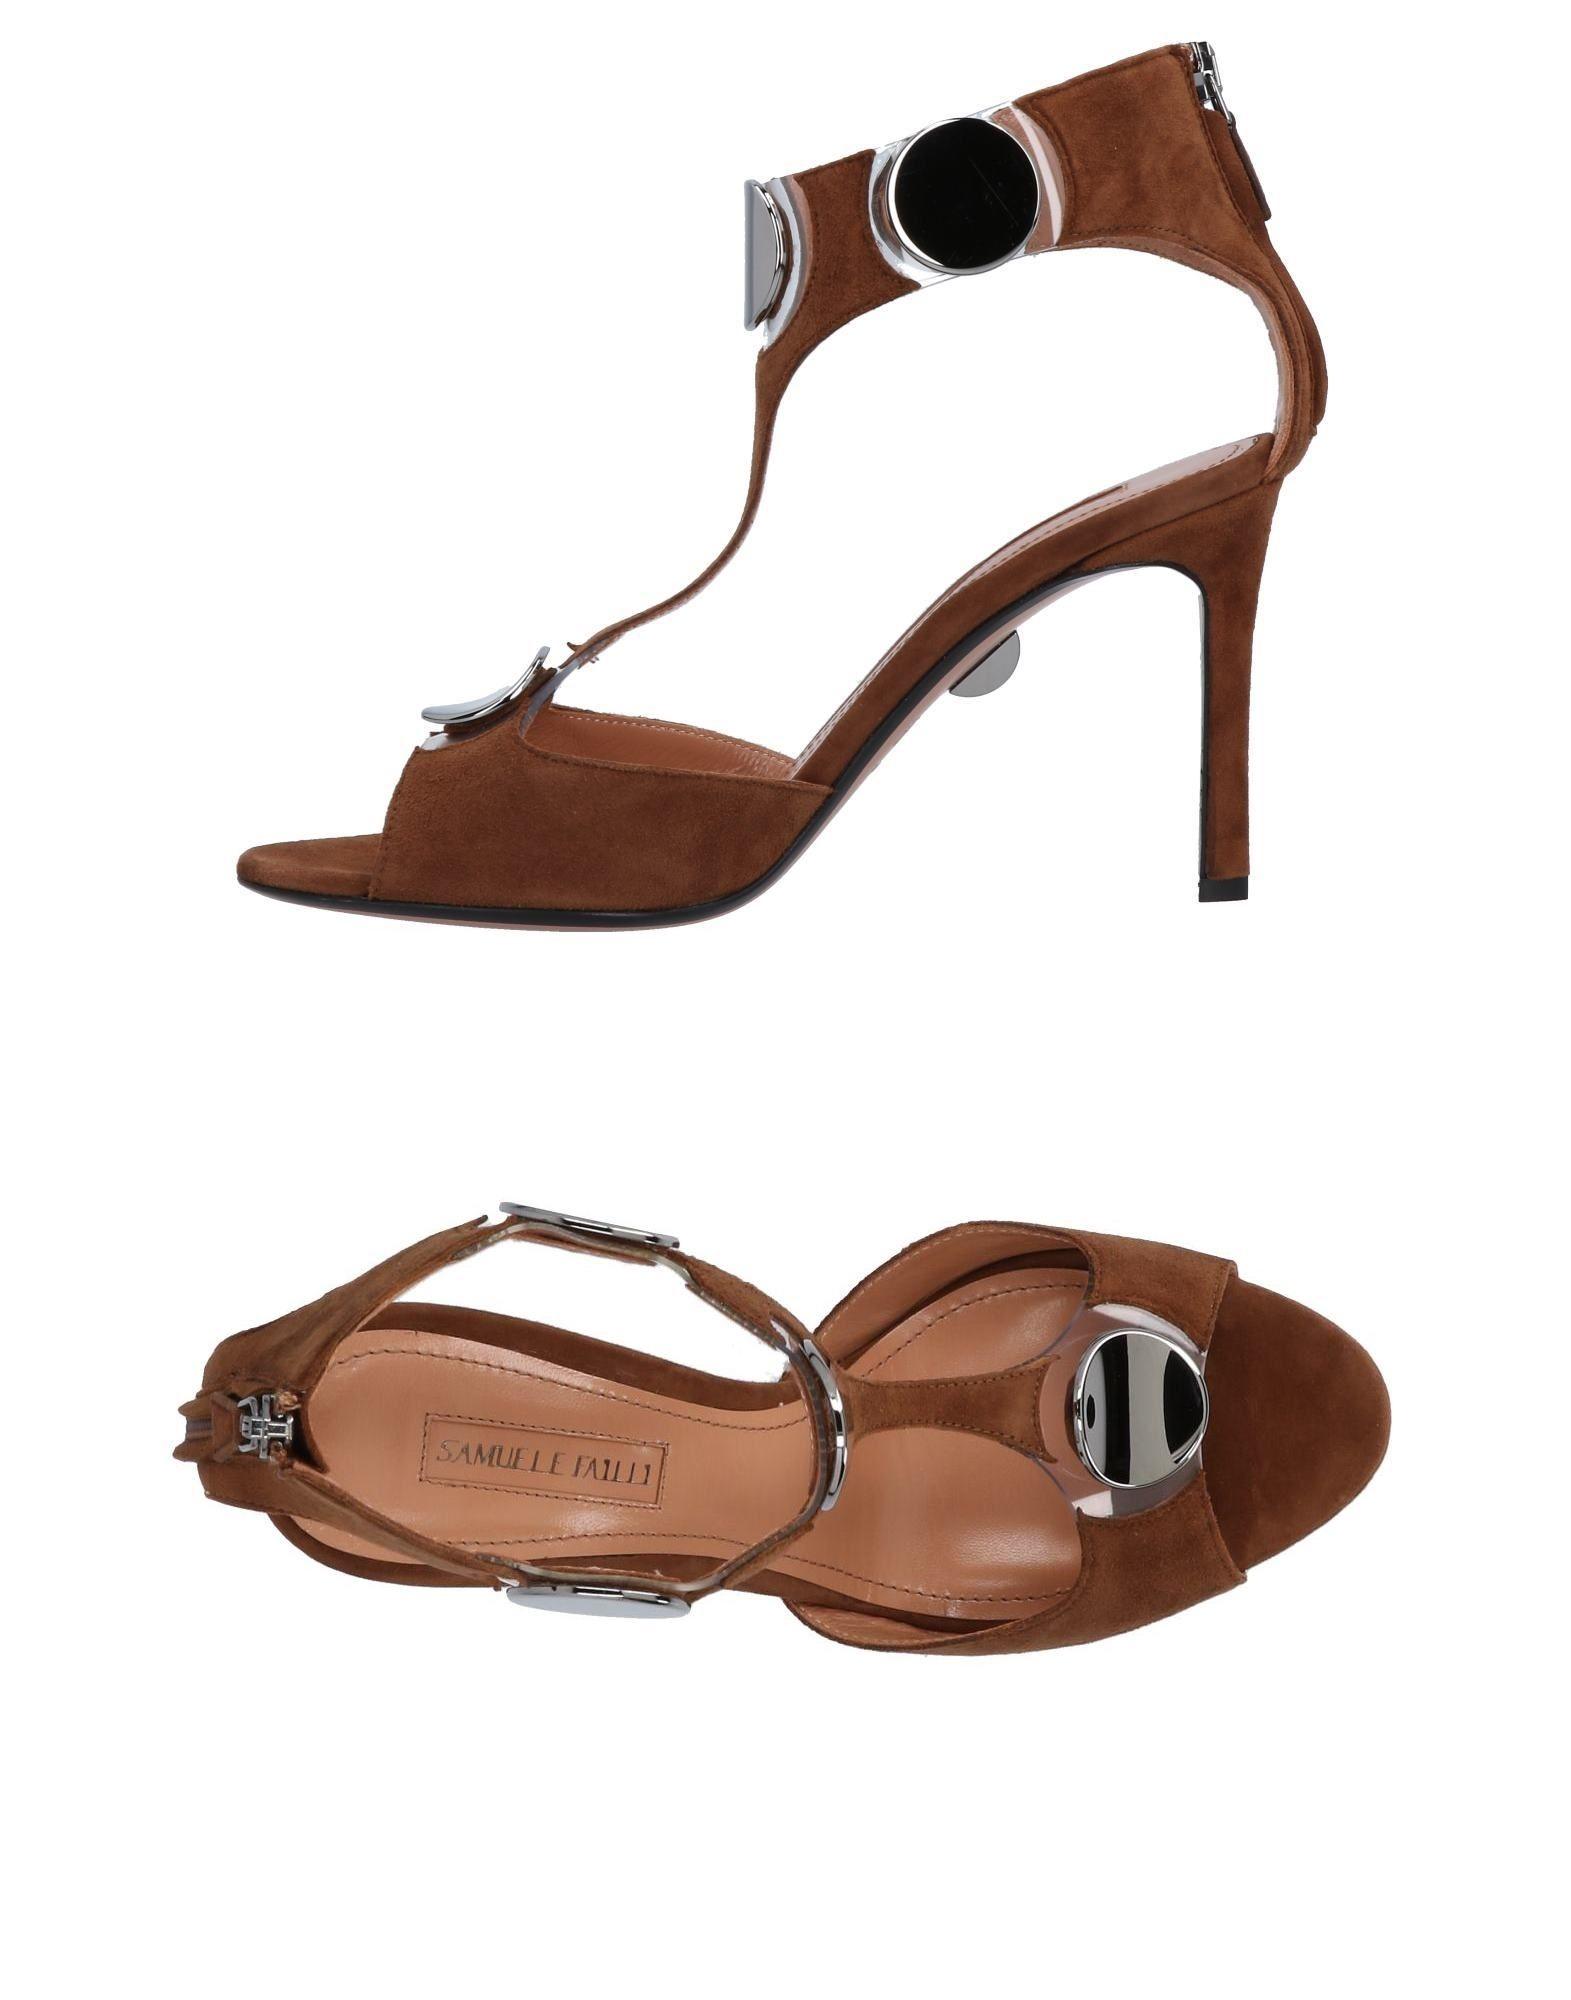 Samuele Failli Sandals Sandals - Women Samuele Failli Sandals Sandals online on  Canada - 11488891GO 81e31e